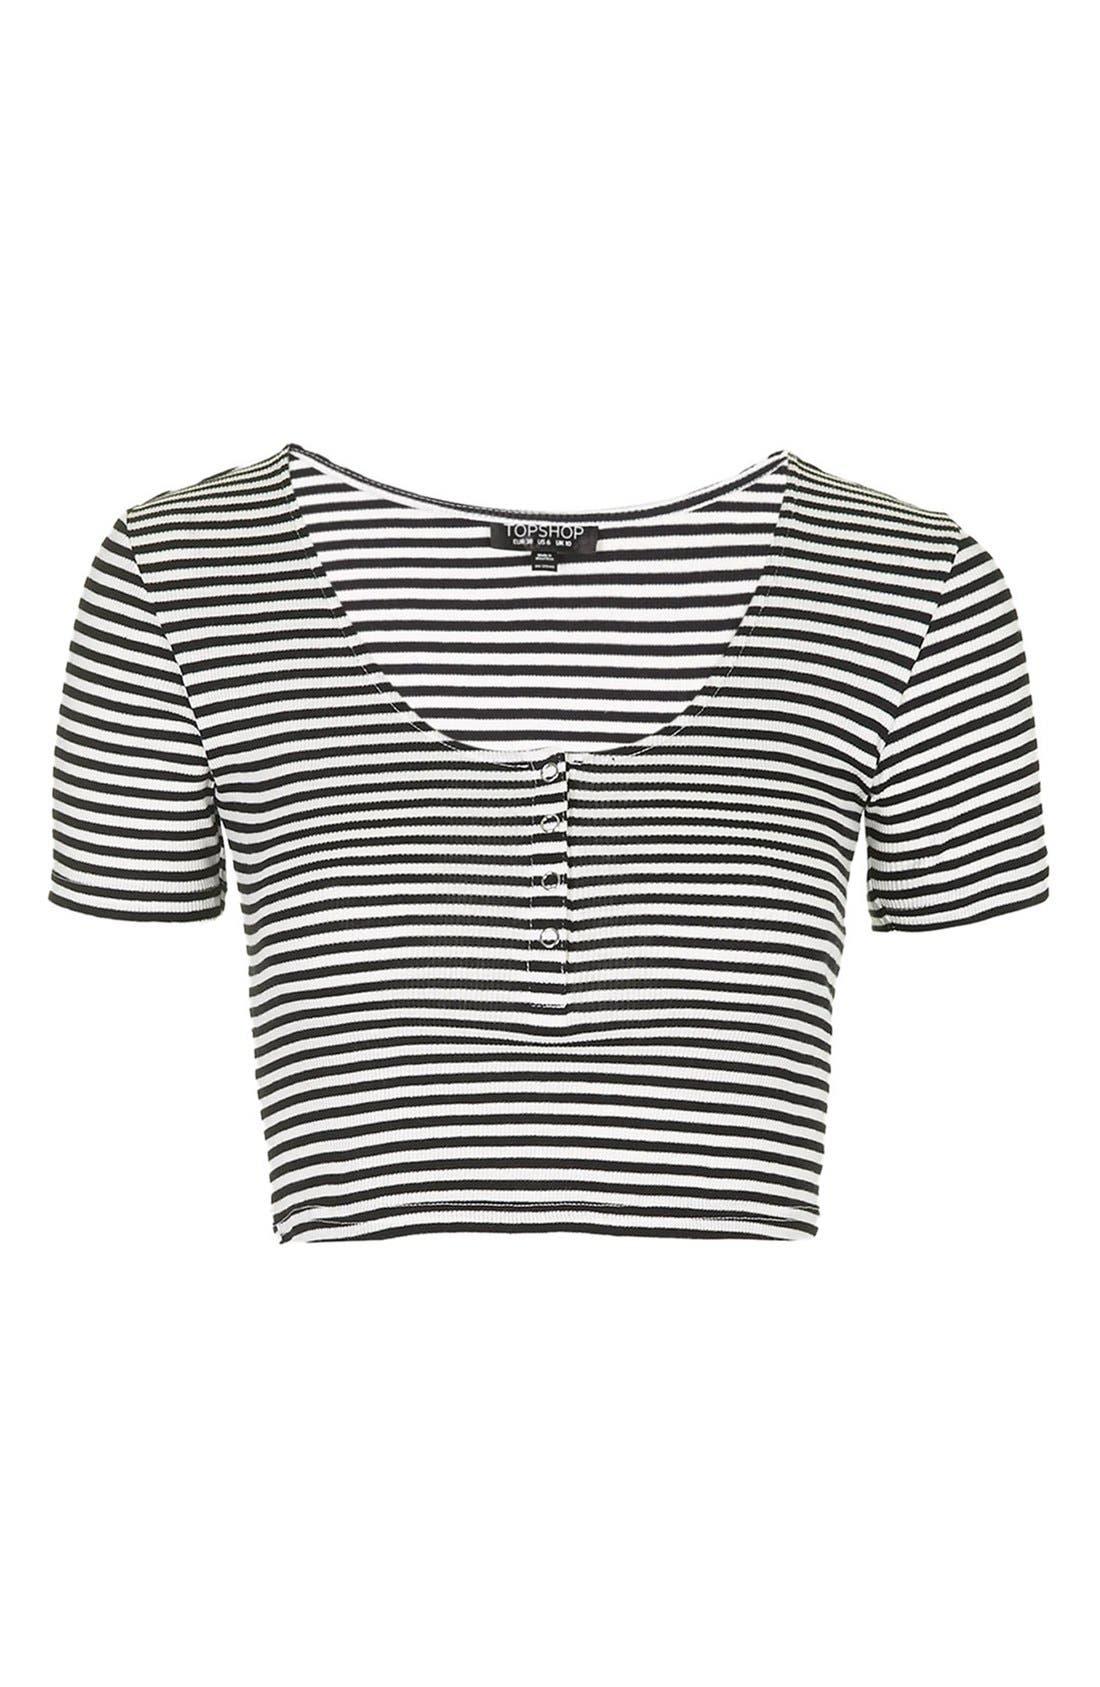 TOPSHOP, Short Sleeve Henley Crop Top, Alternate thumbnail 2, color, 900